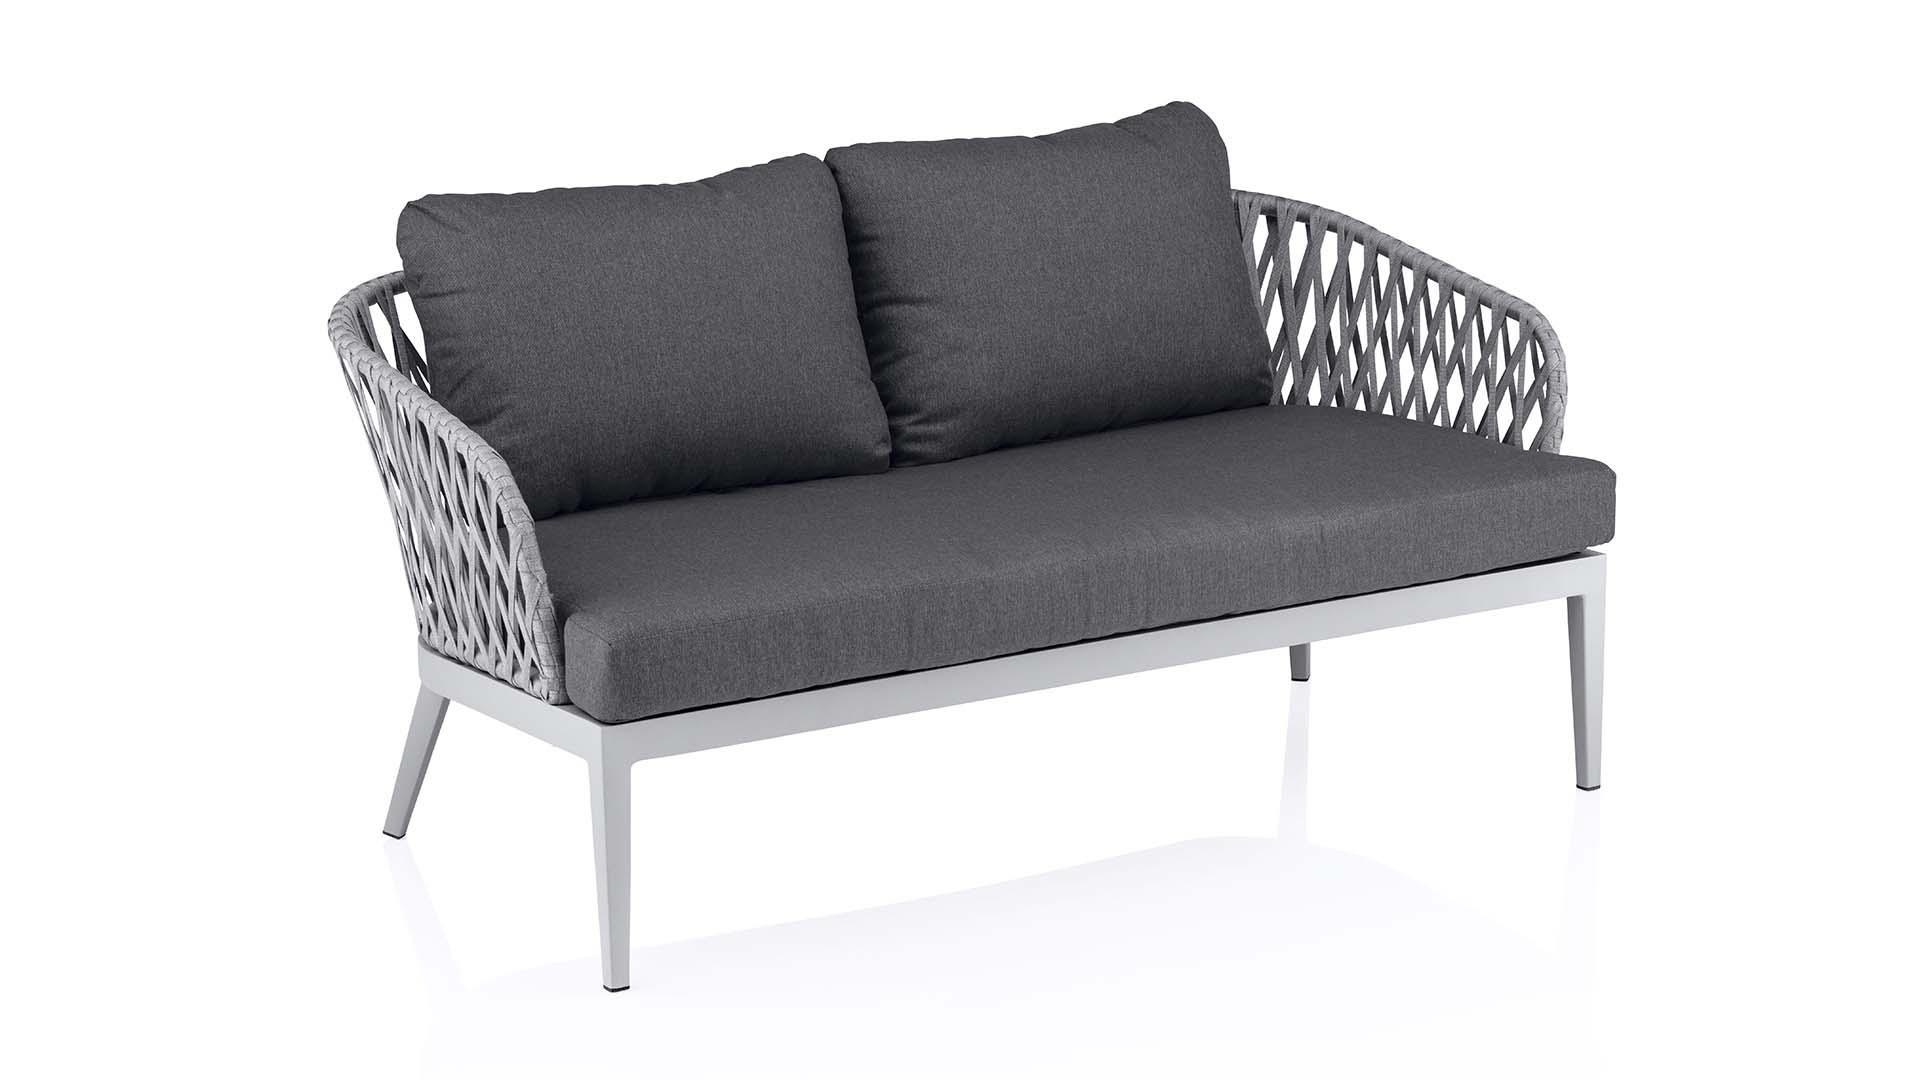 SUNNY Lounge 2er Sofa